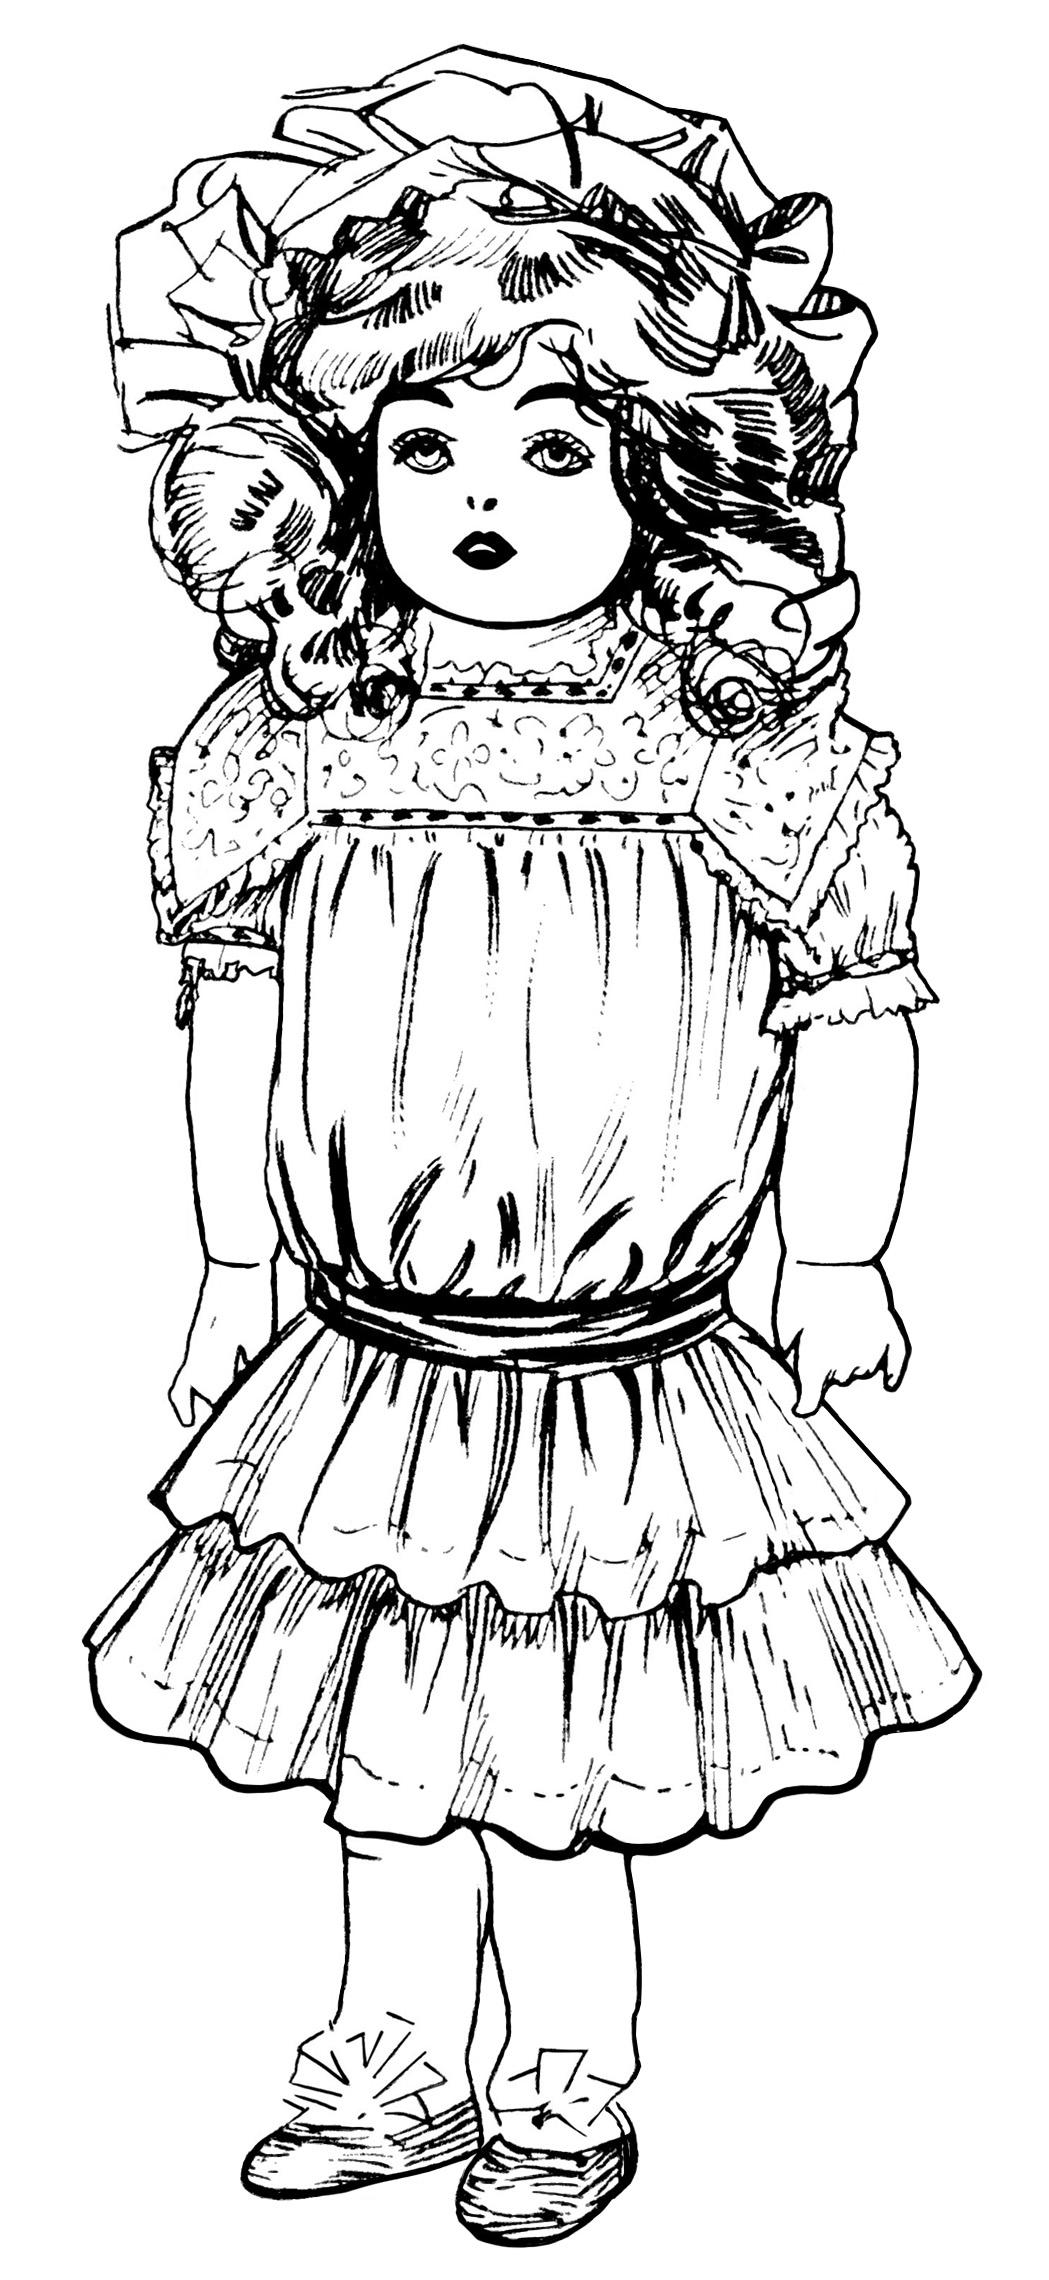 Victorian clipart vintage toy Art doll black art illustration